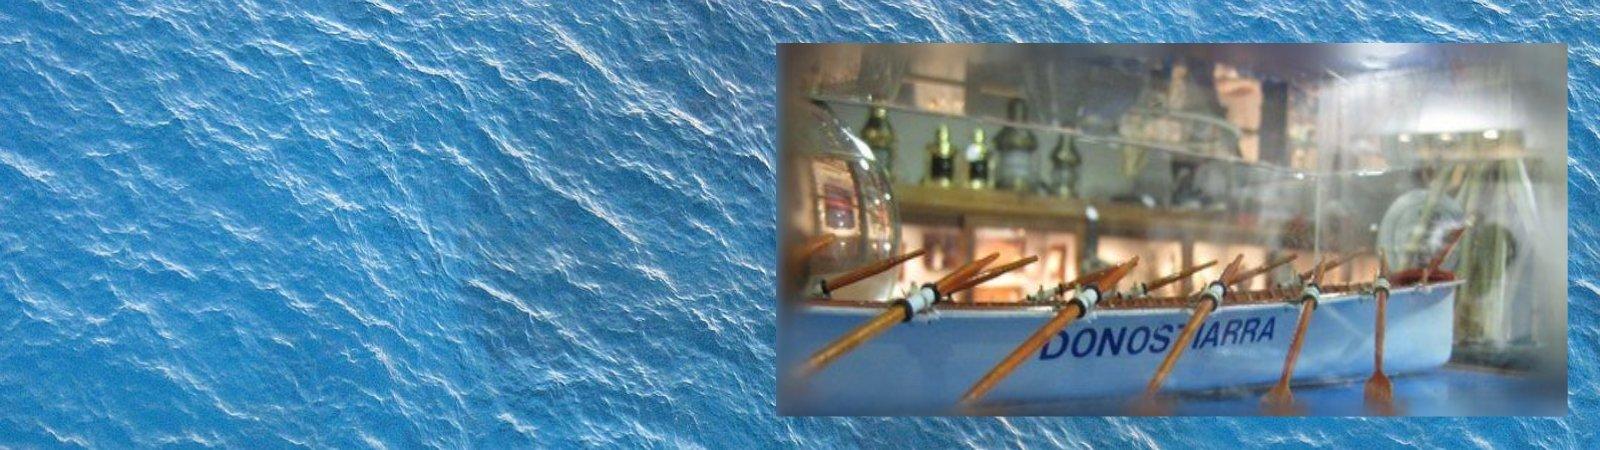 Instrumentos de navegación en Donostia,instrumentos de navegacion en san sebastian